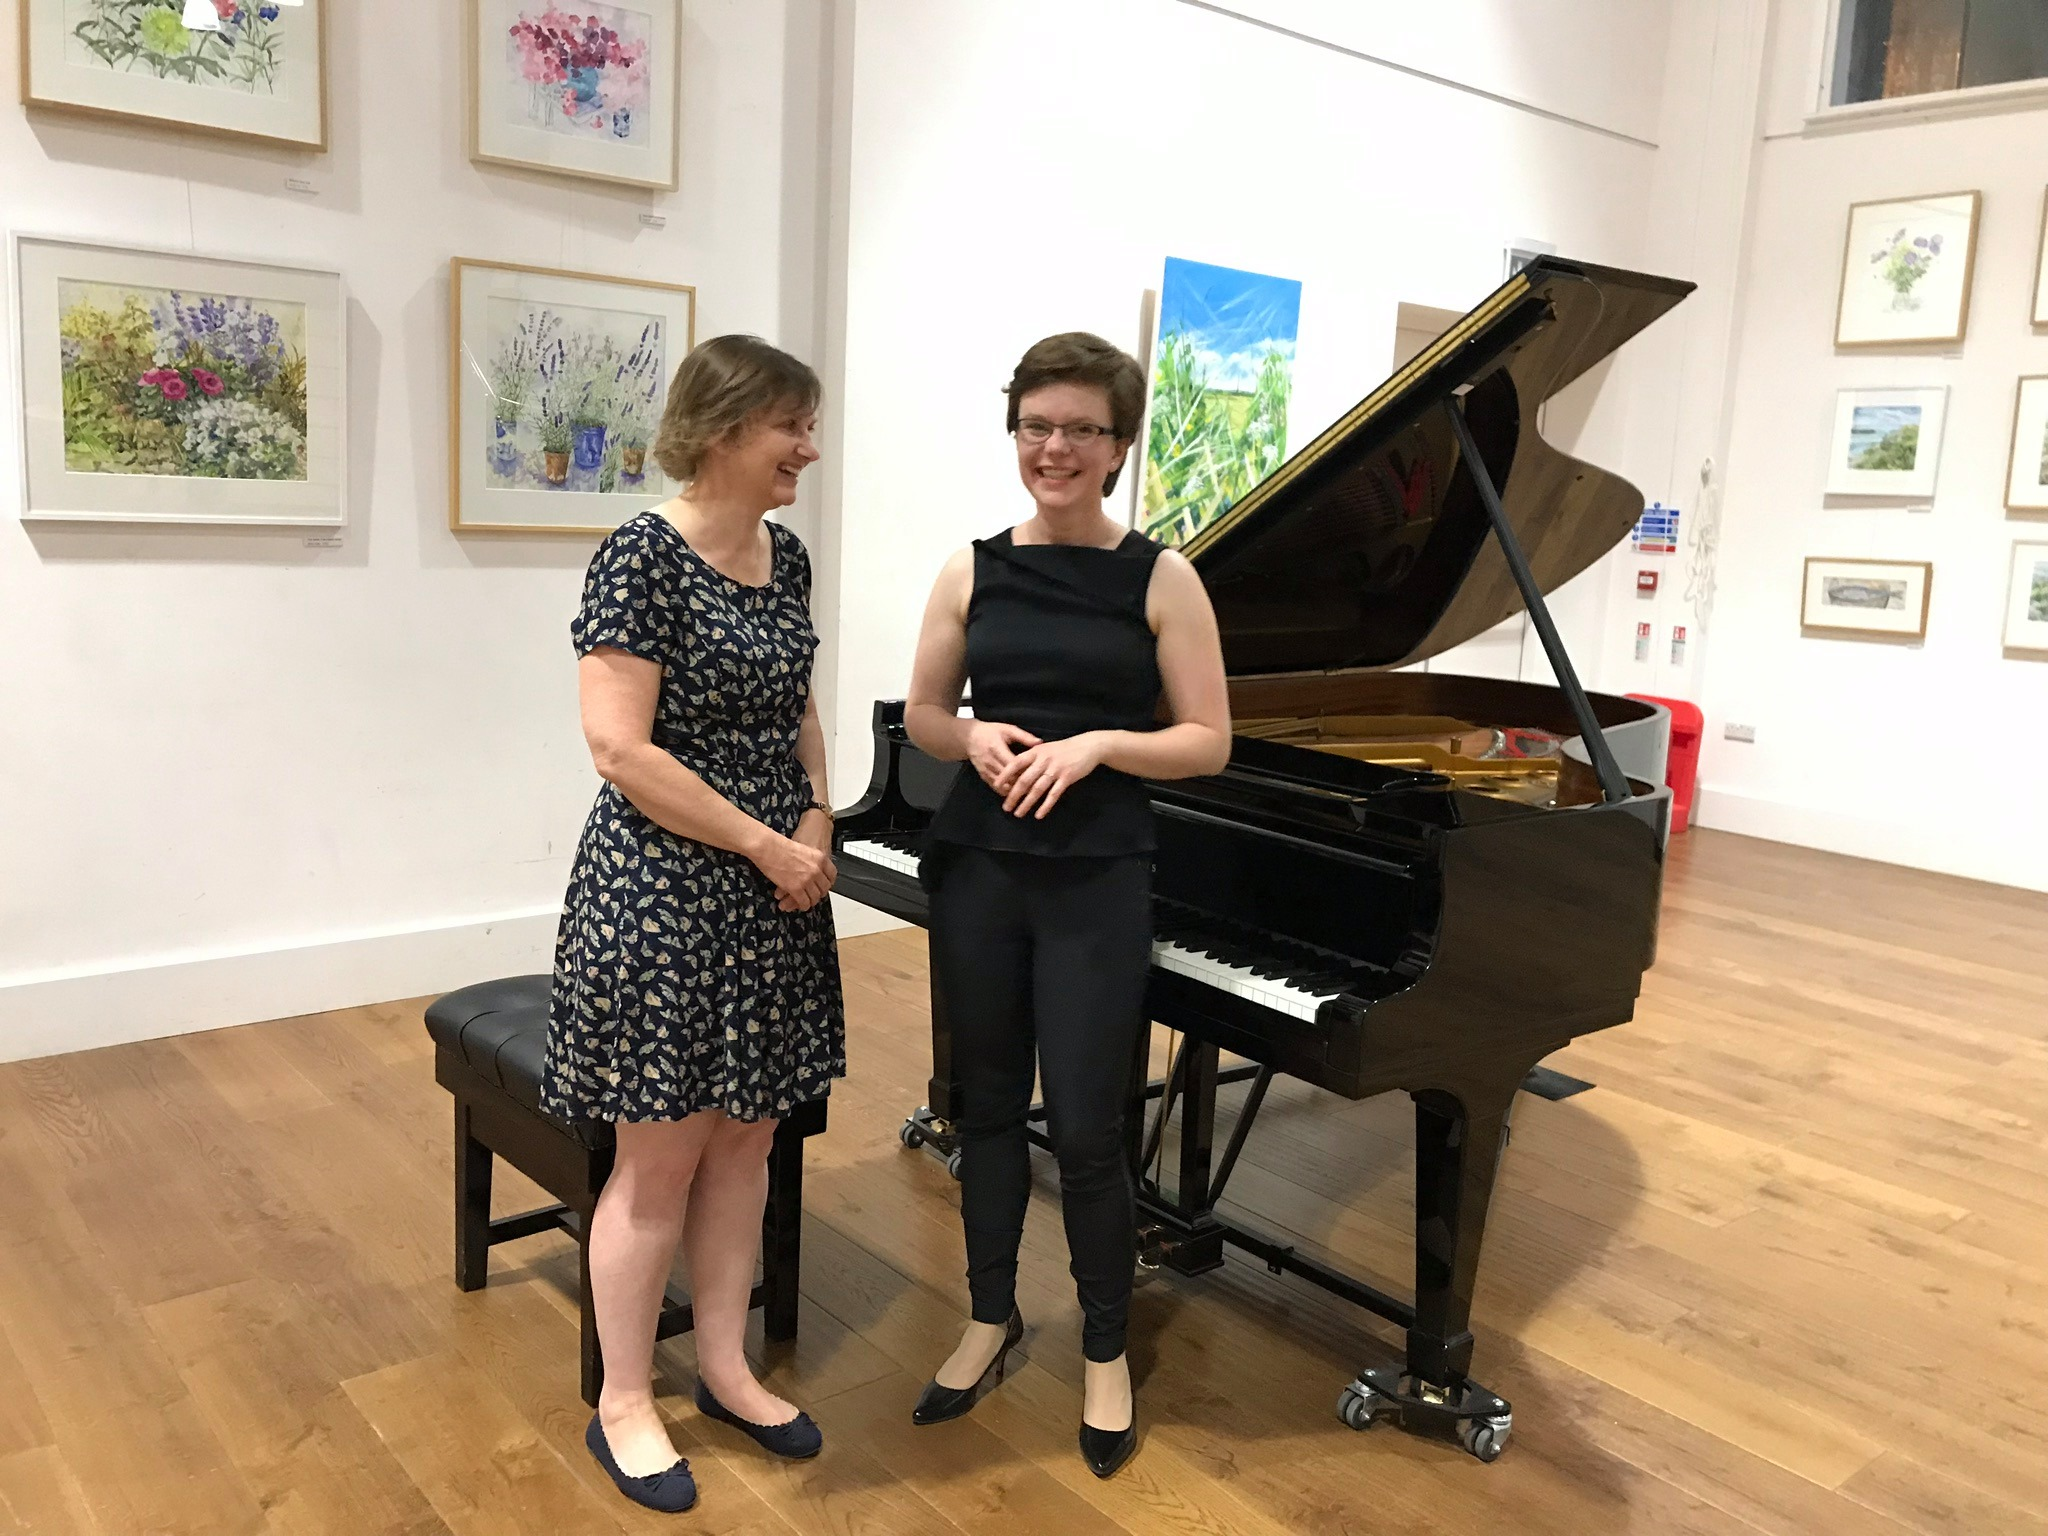 Ballad, Clare Hammond, Tetbury Goods Shed, 12 July 2019